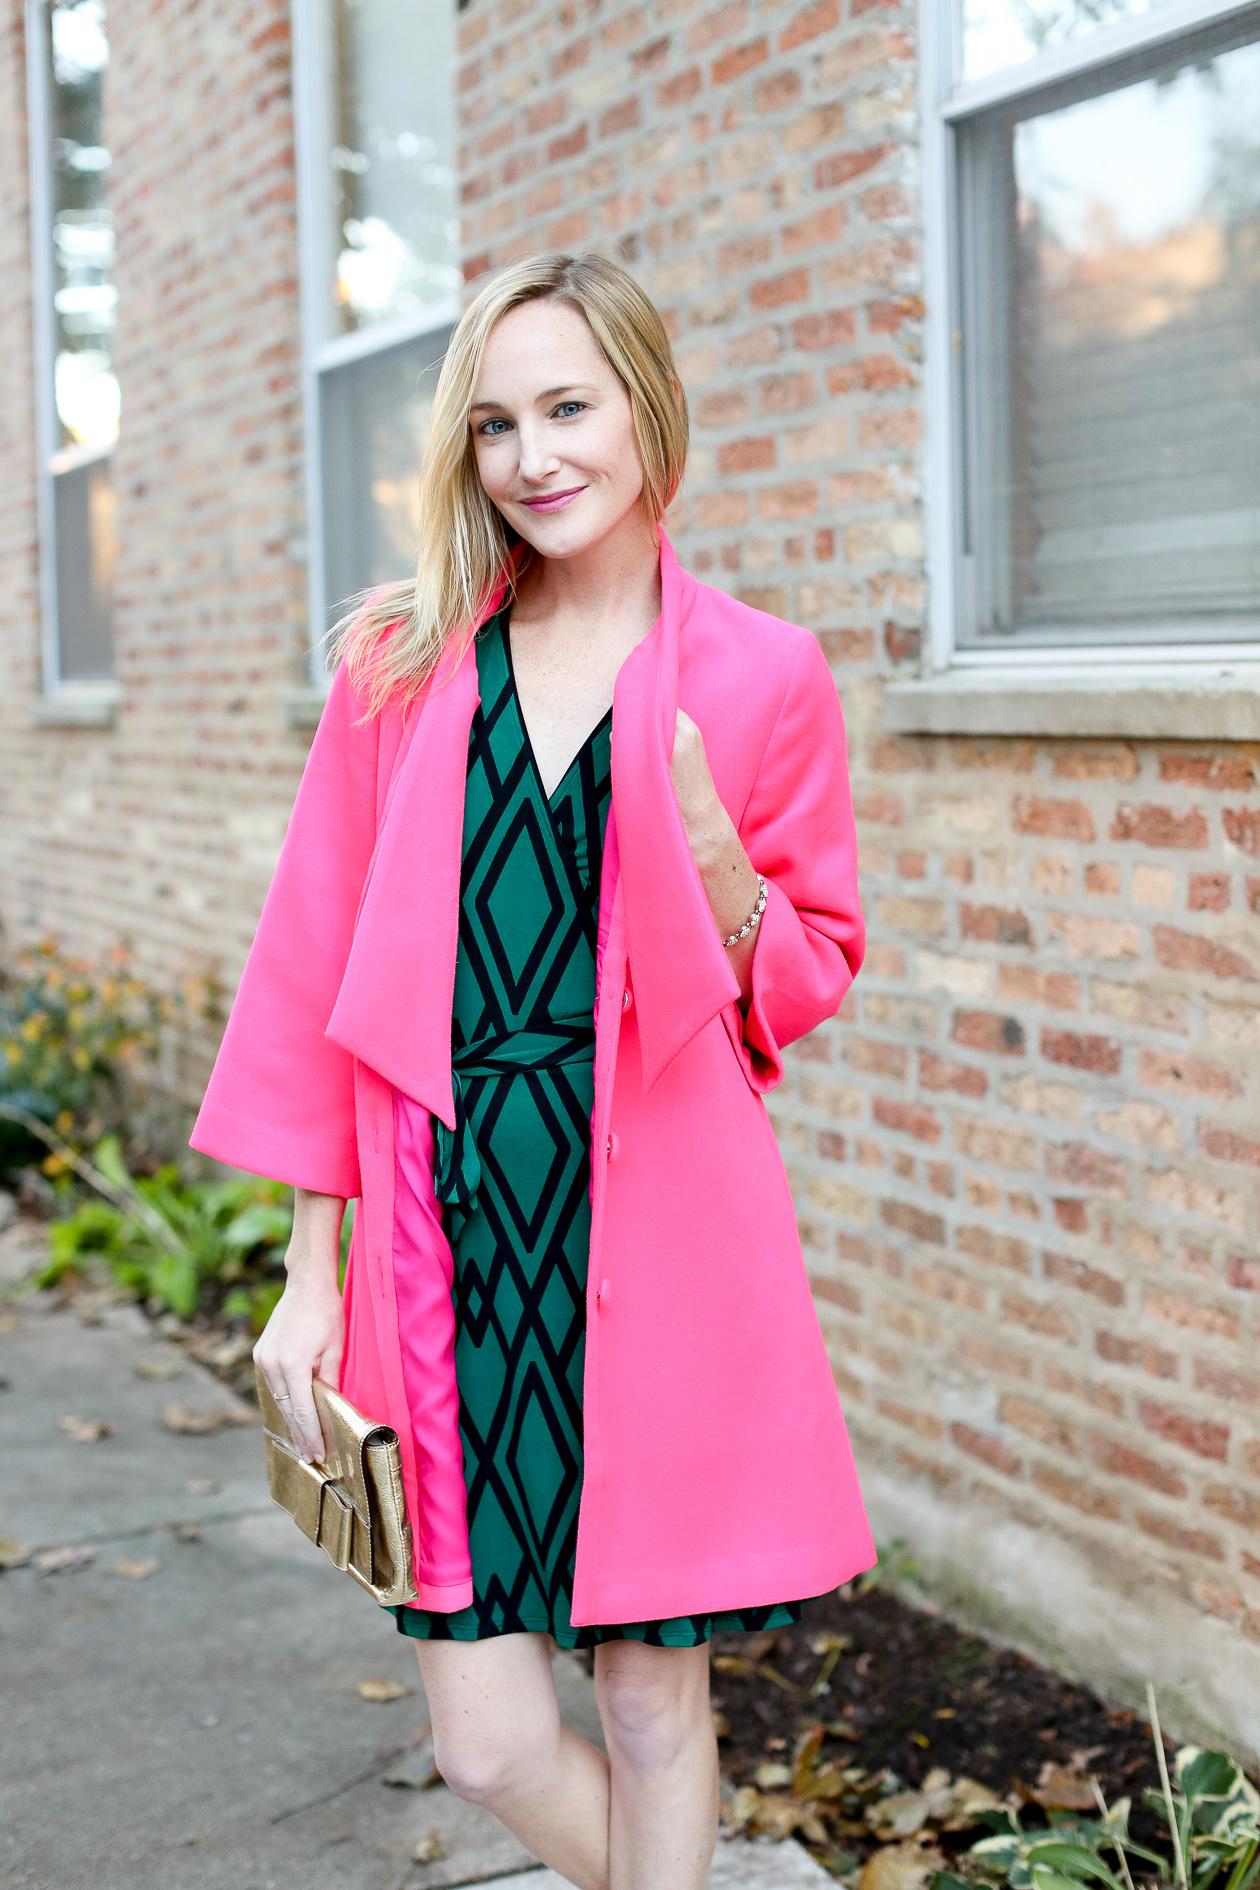 Leota Dress Pink Suede Pumps-77